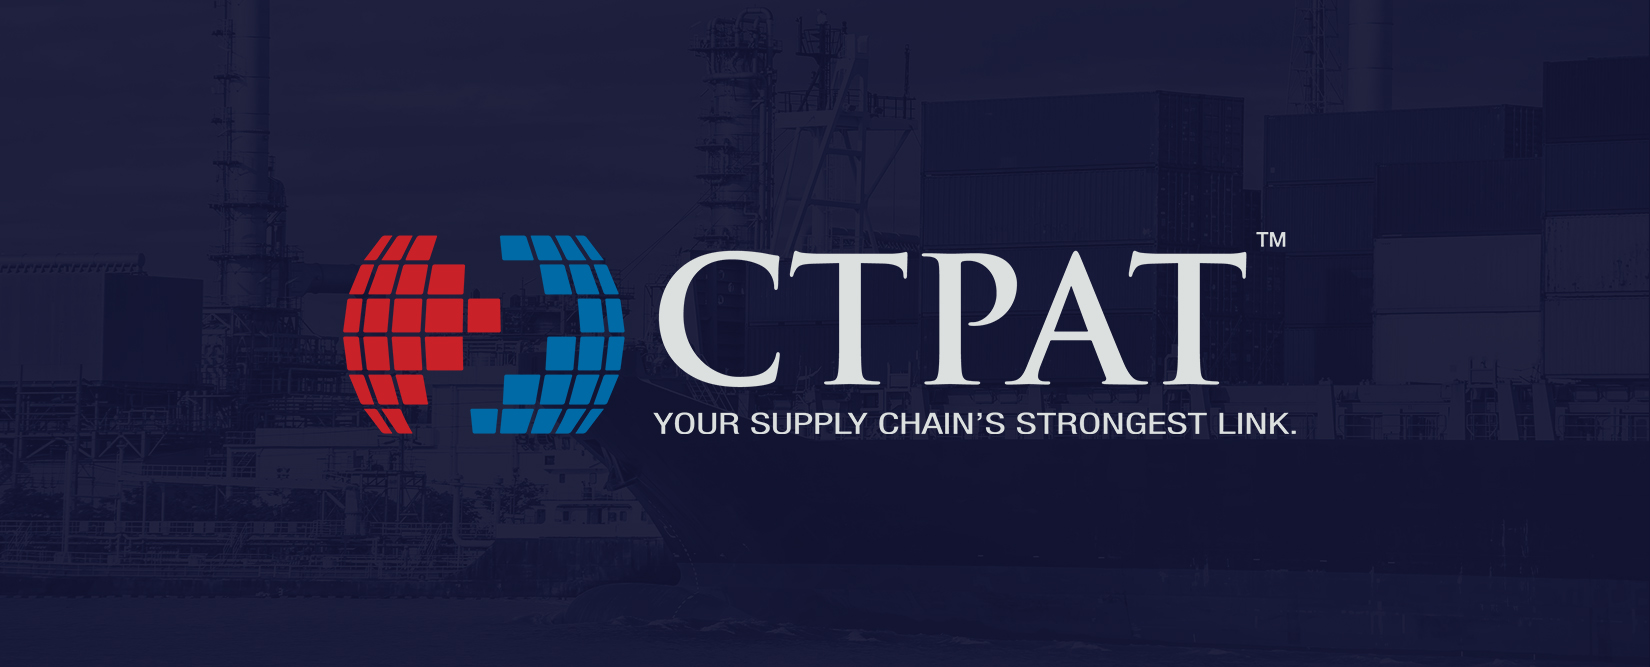 CTPAT.jpg